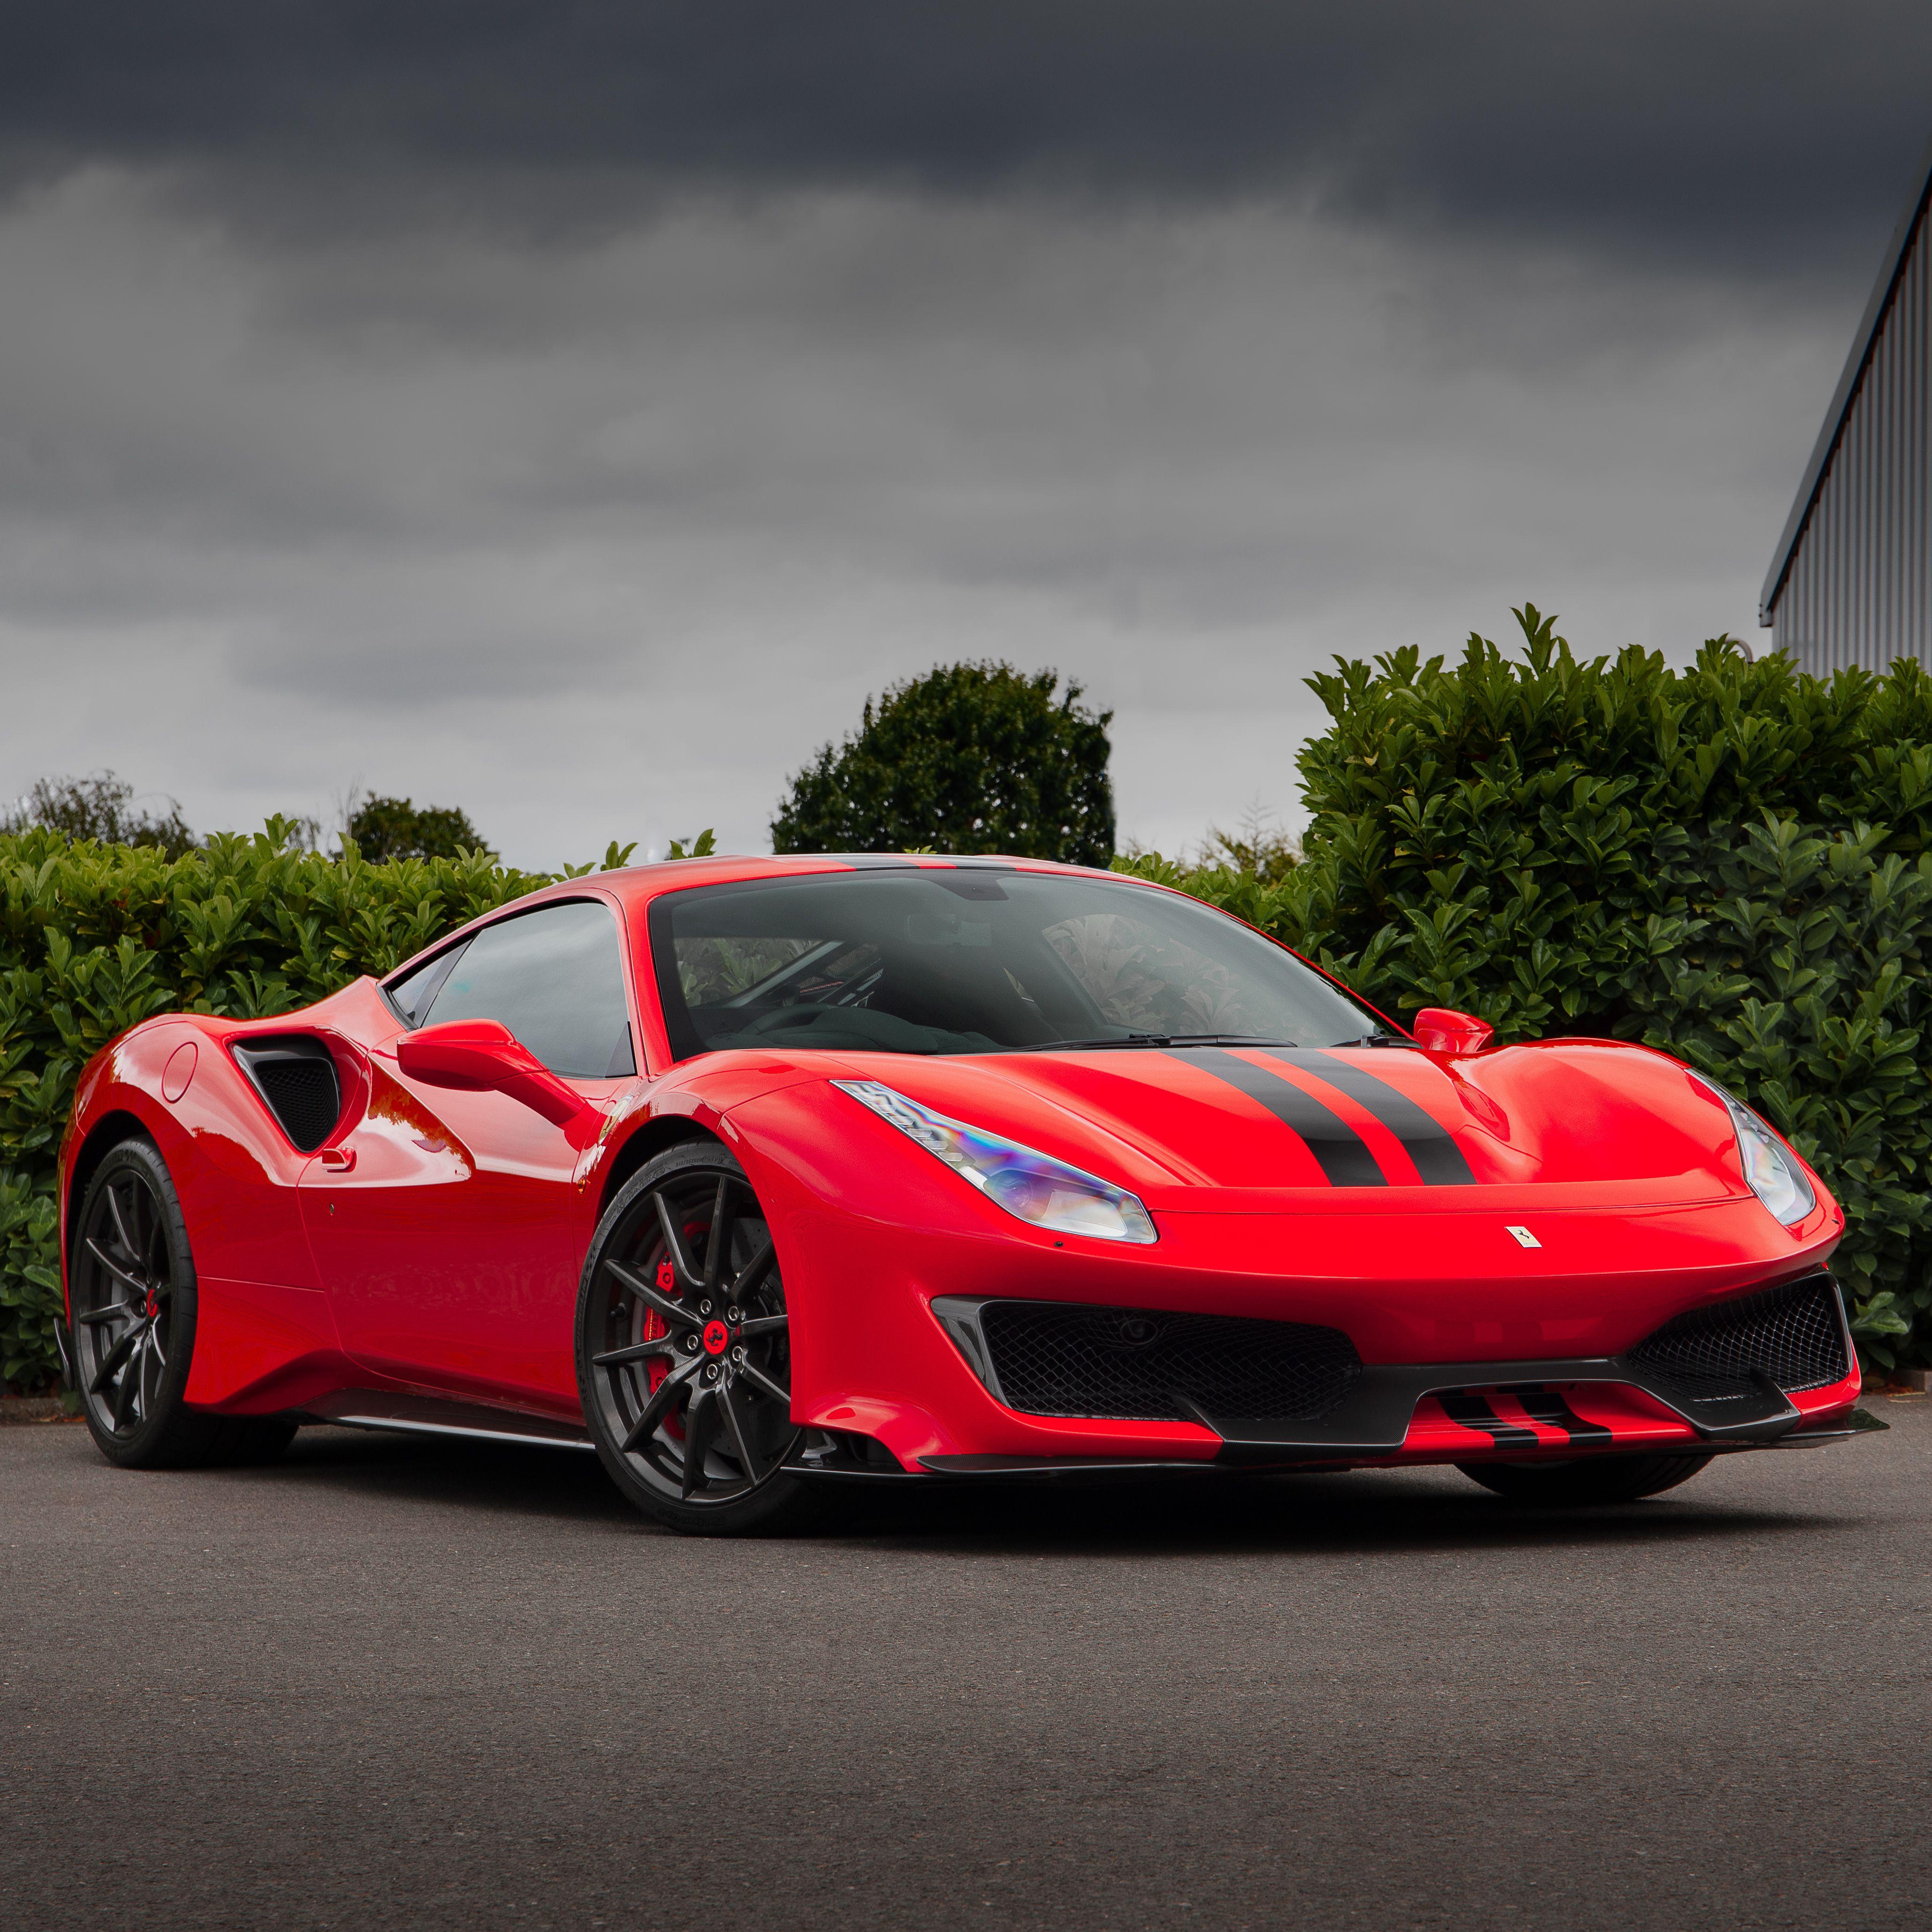 488 Pista With Carbon Fibre Wheels Ferrari Expensive Sports Cars Super Cars